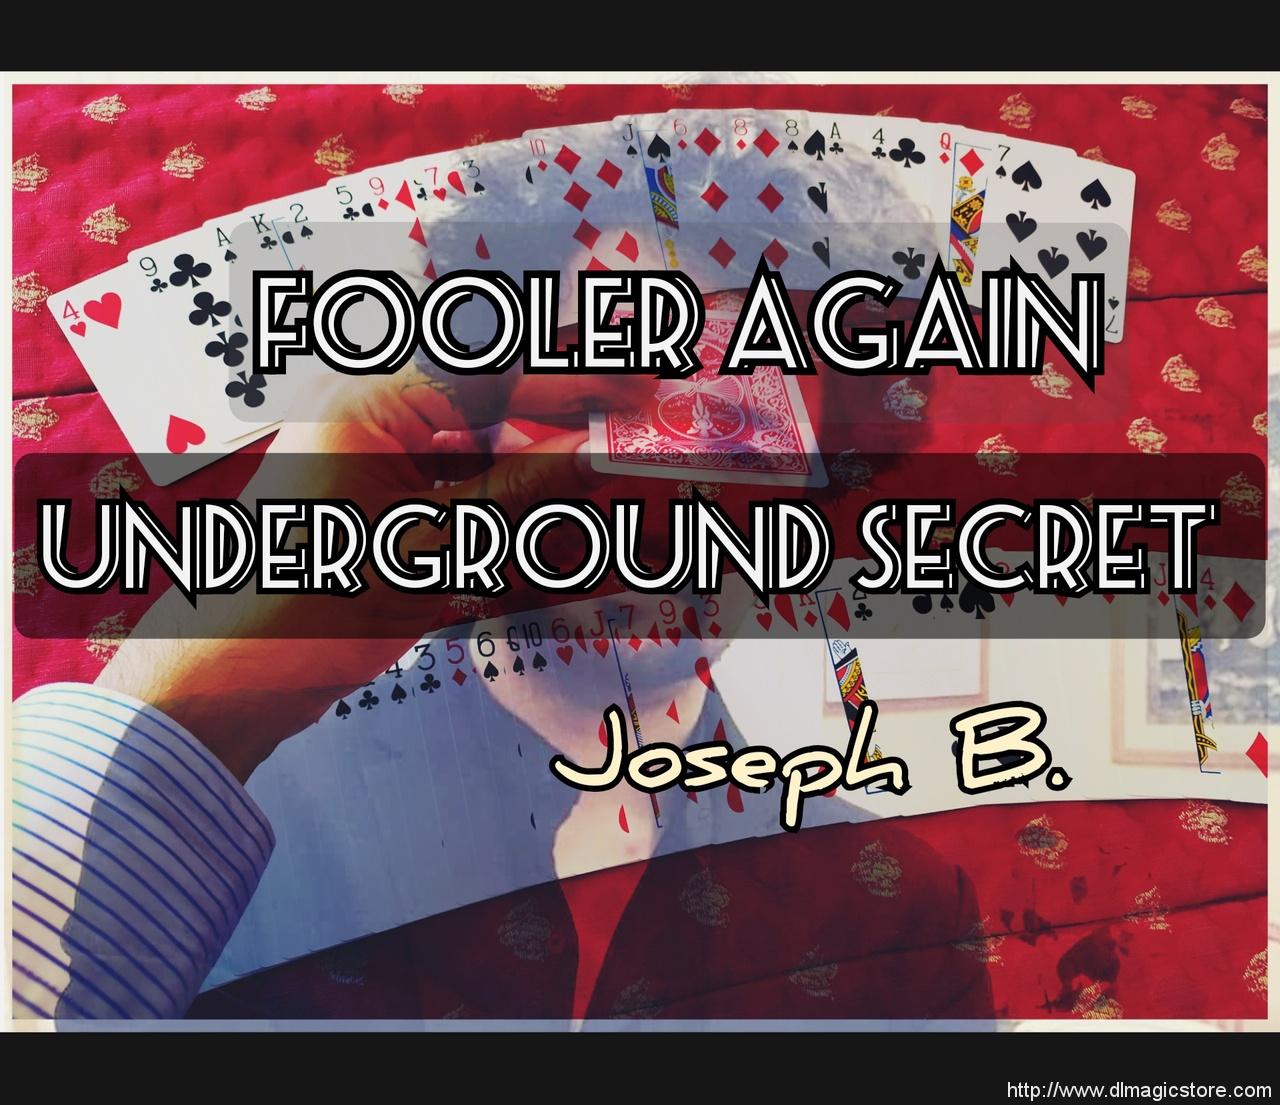 FOOLER AGAIN by Joseph B. (Instant Download)